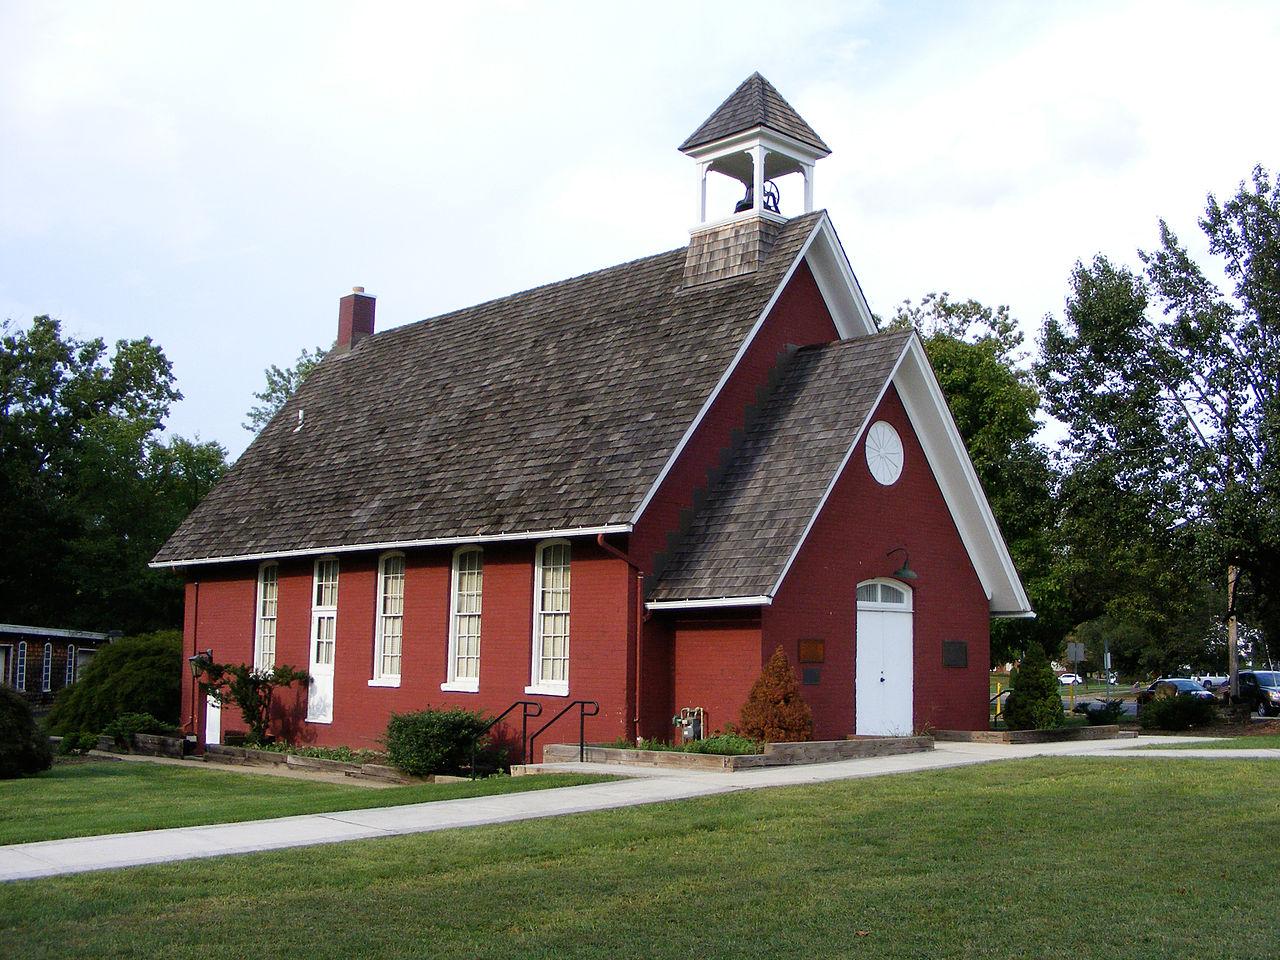 FileFlorham Park NJ Little Red Schoolhouse